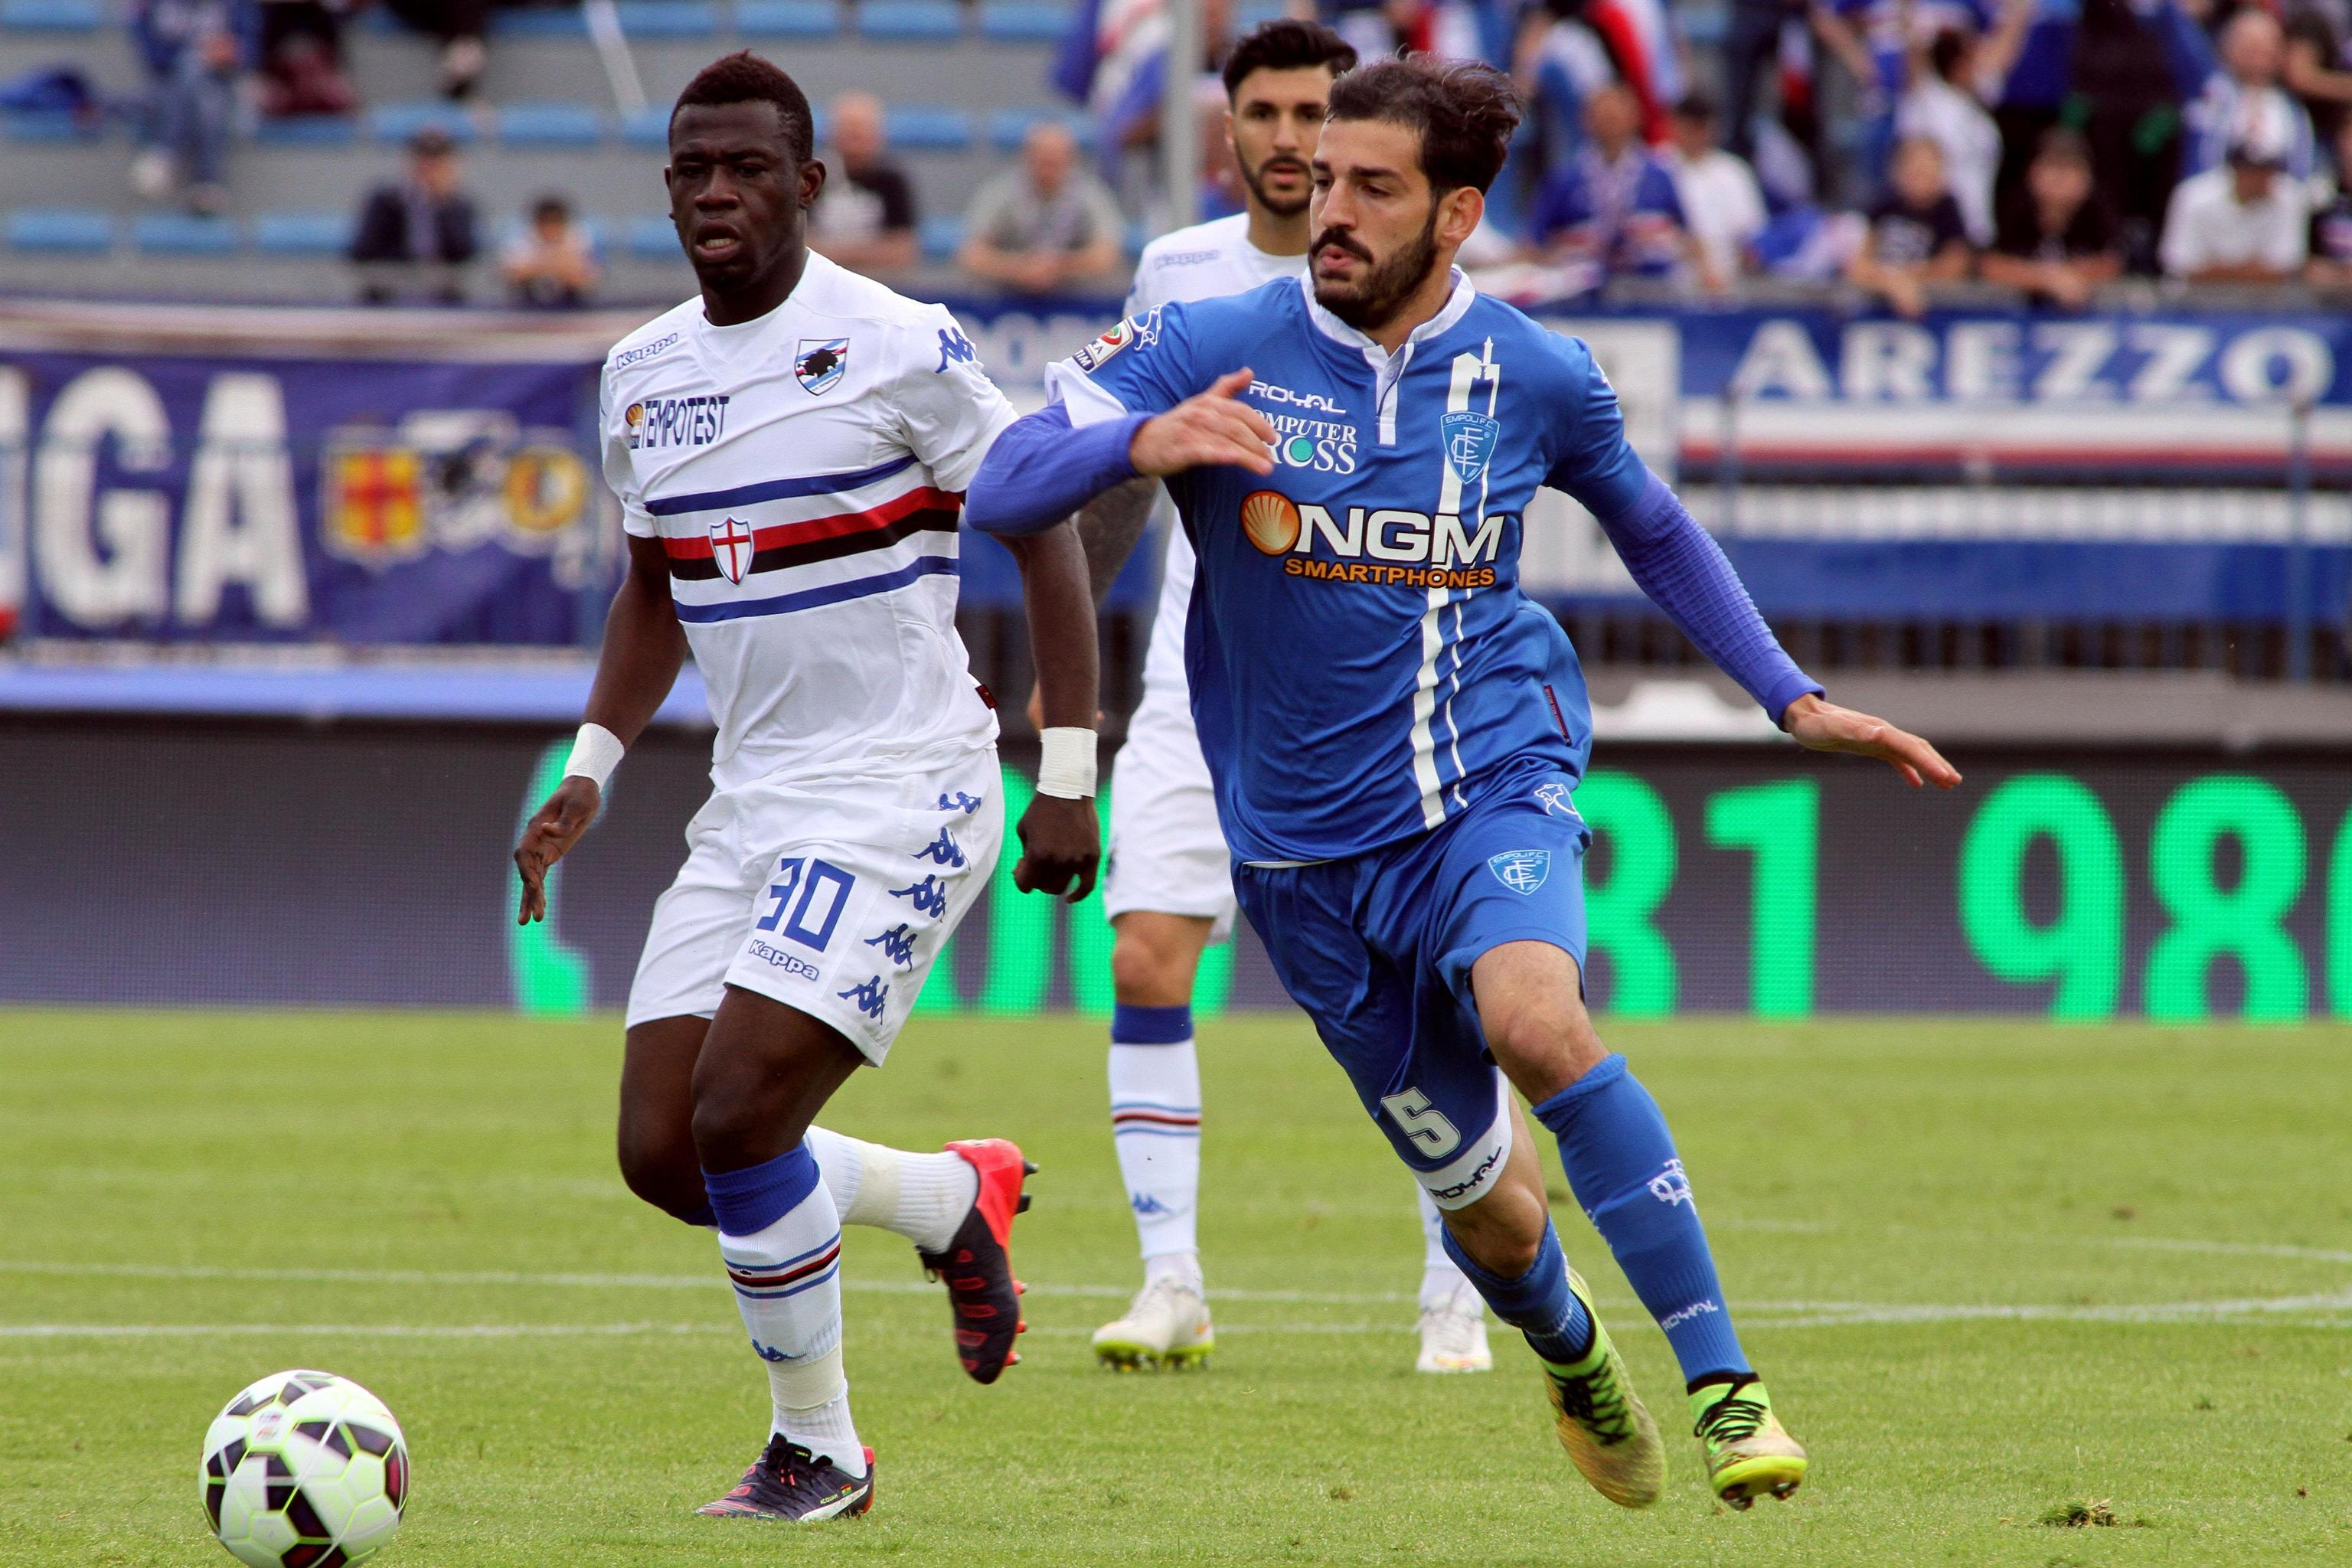 Soccer: serie A, Empoli-Sampdoria